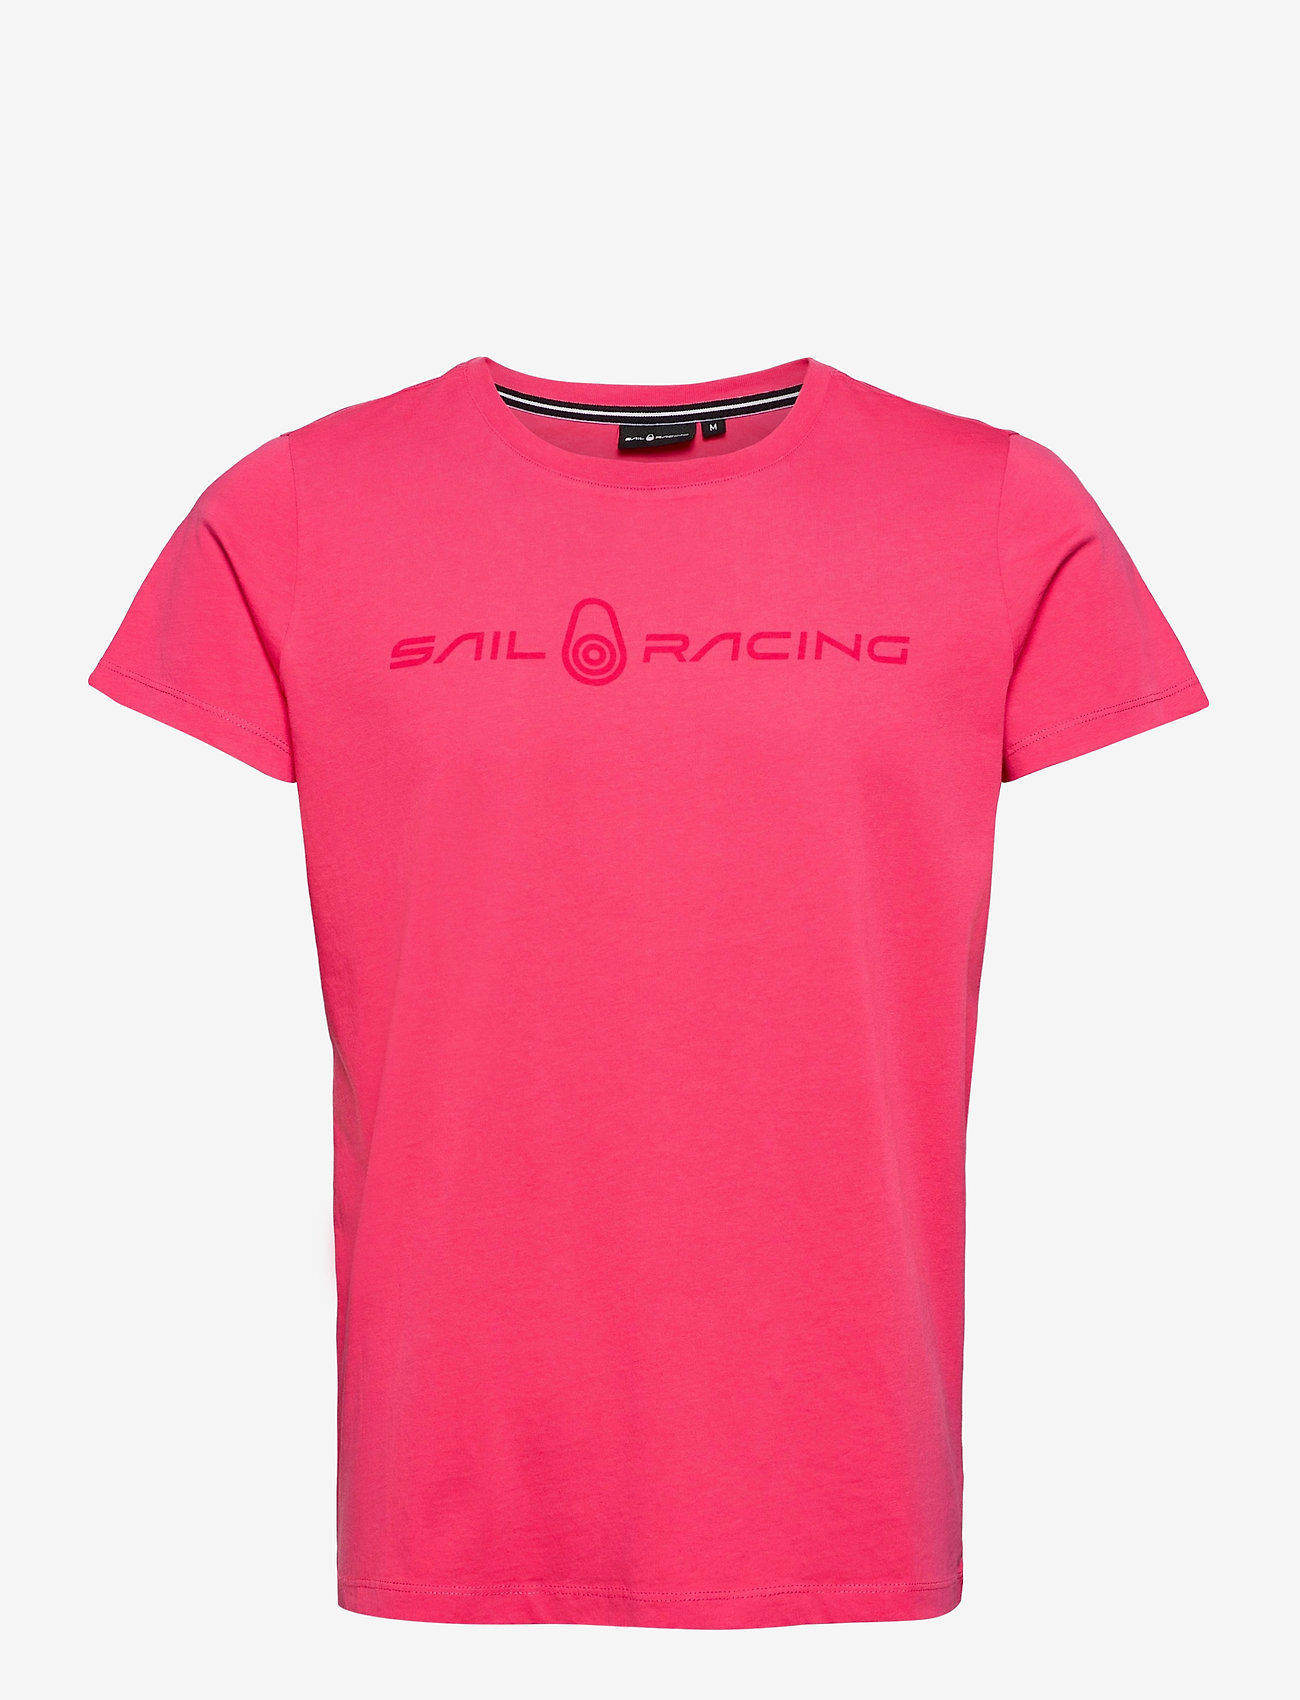 Sail Racing - BOWMAN TEE - sports tops - strong pink - 0